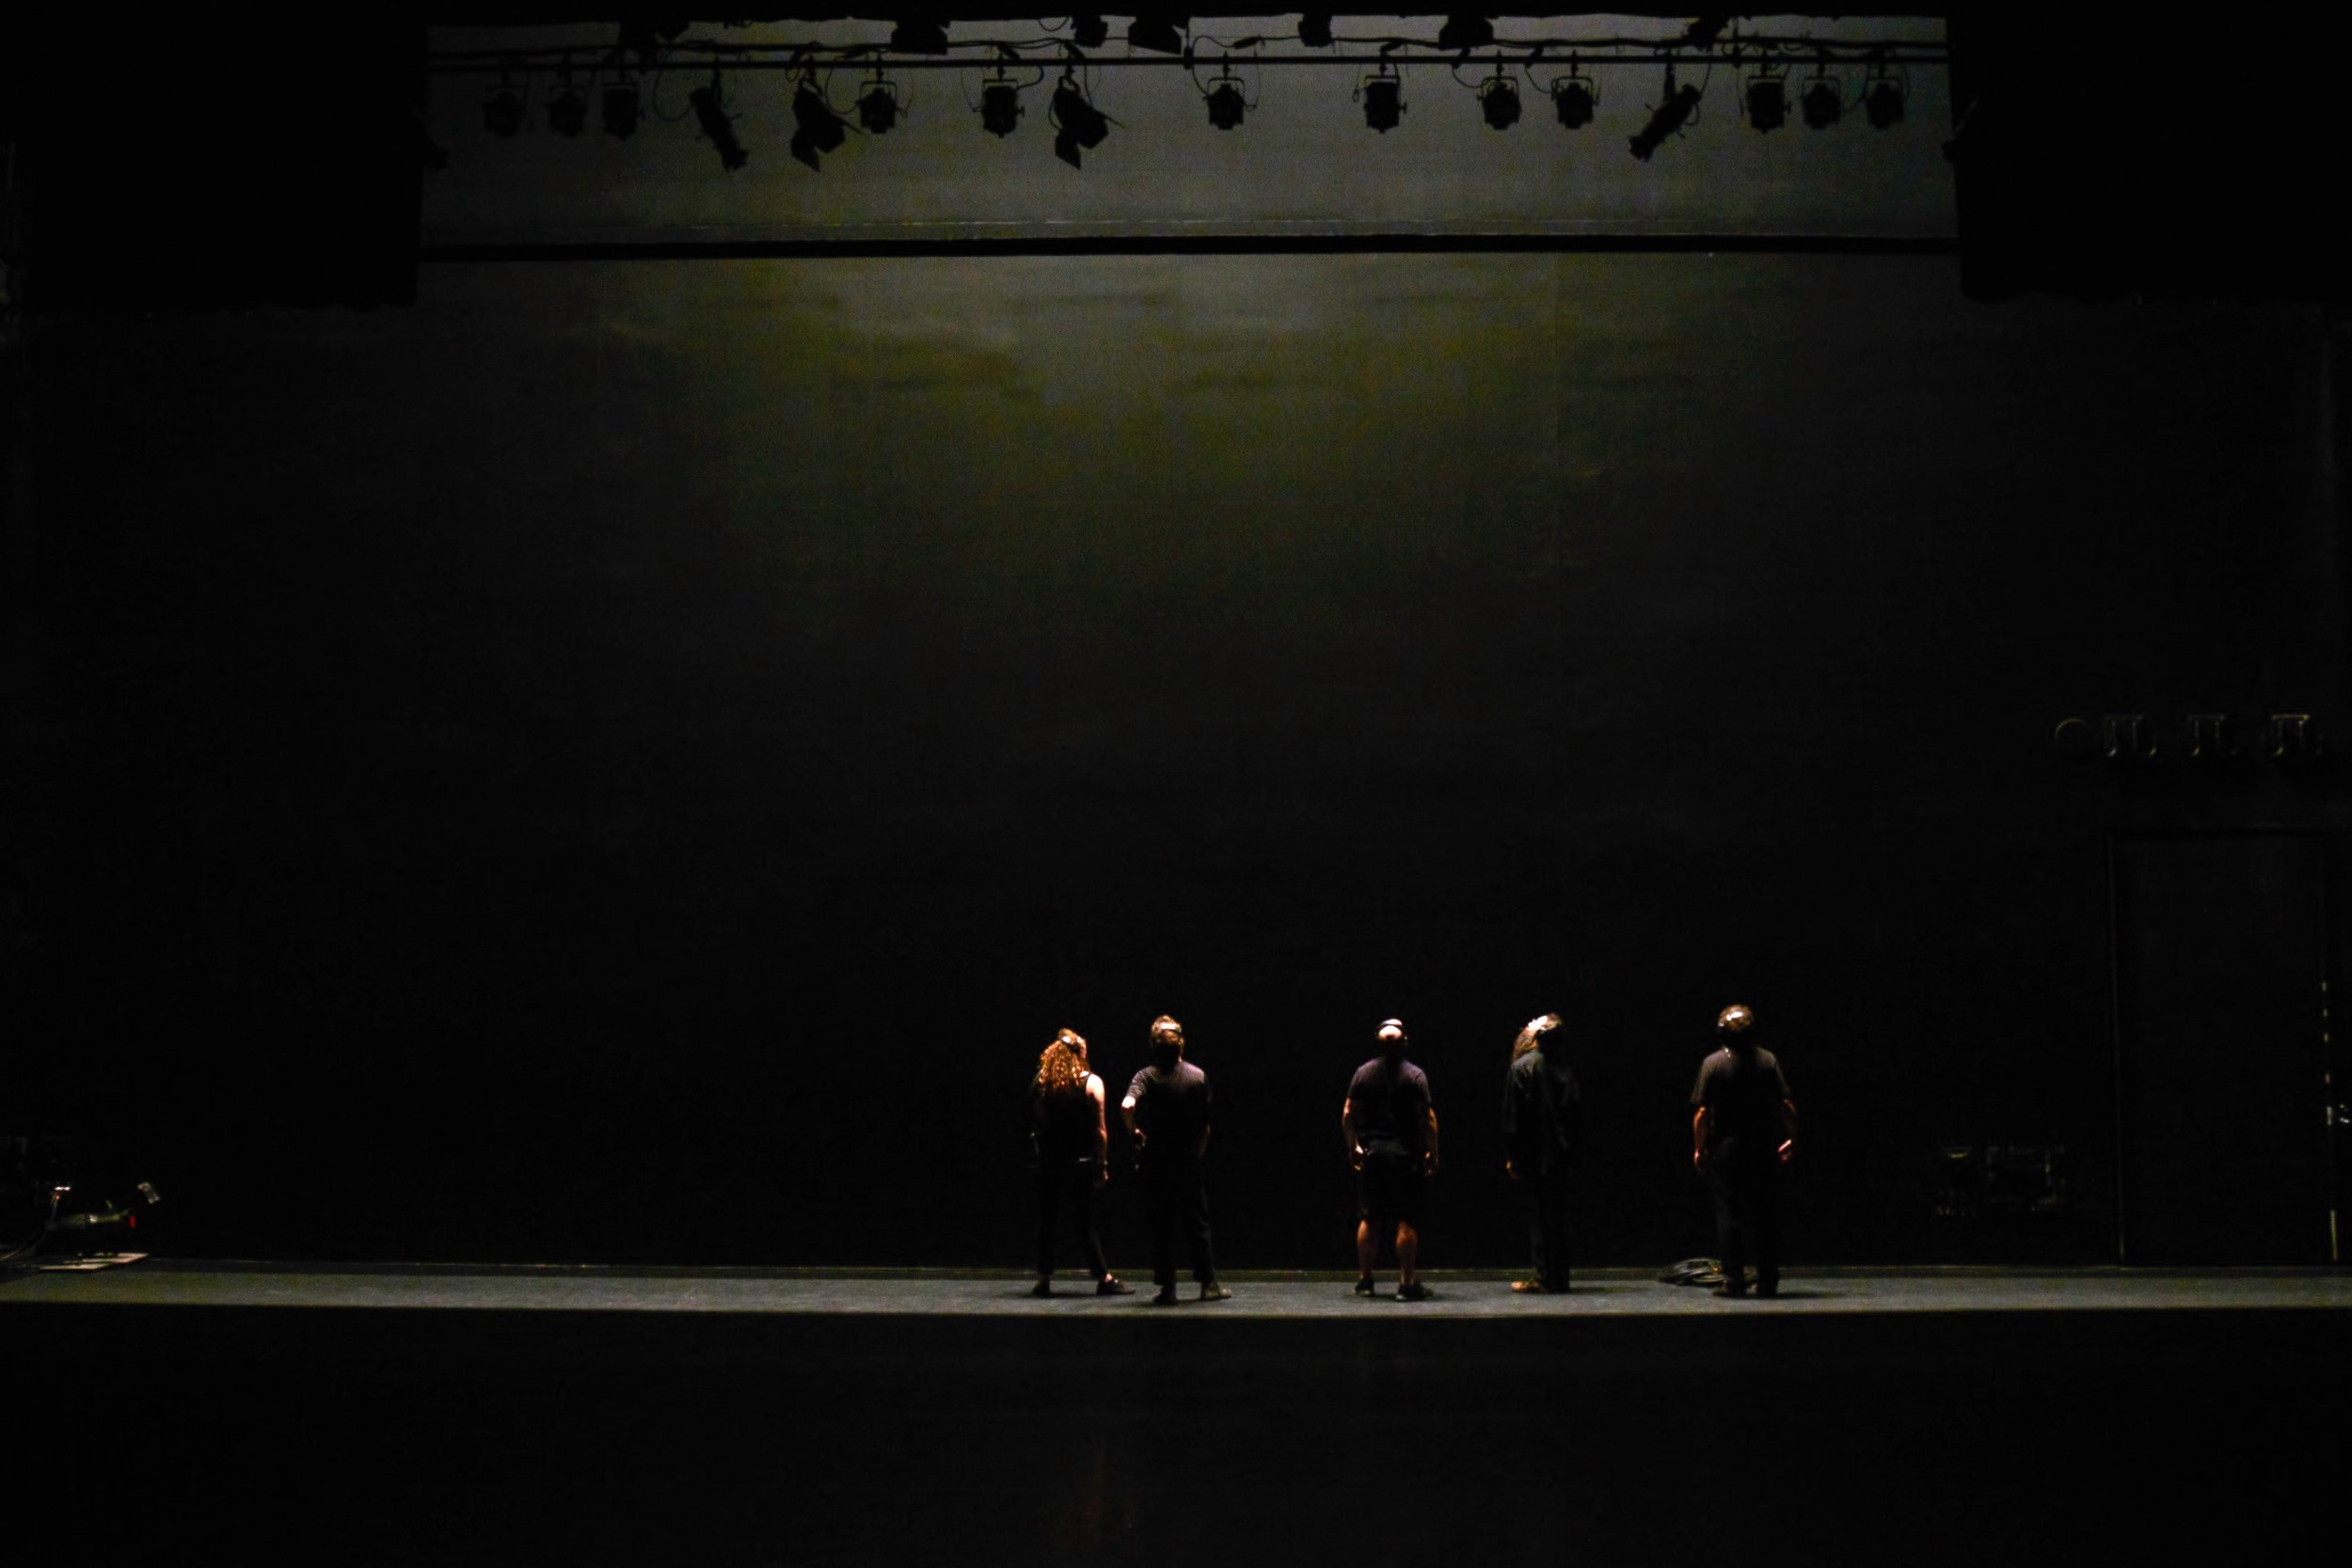 L to R: Emily McGillicuddy, Ross Orenstein, Christian Gaylord, Andy Kedl, Phillip O'Toole. Photo: Gene Pittman, Walker Art Center.